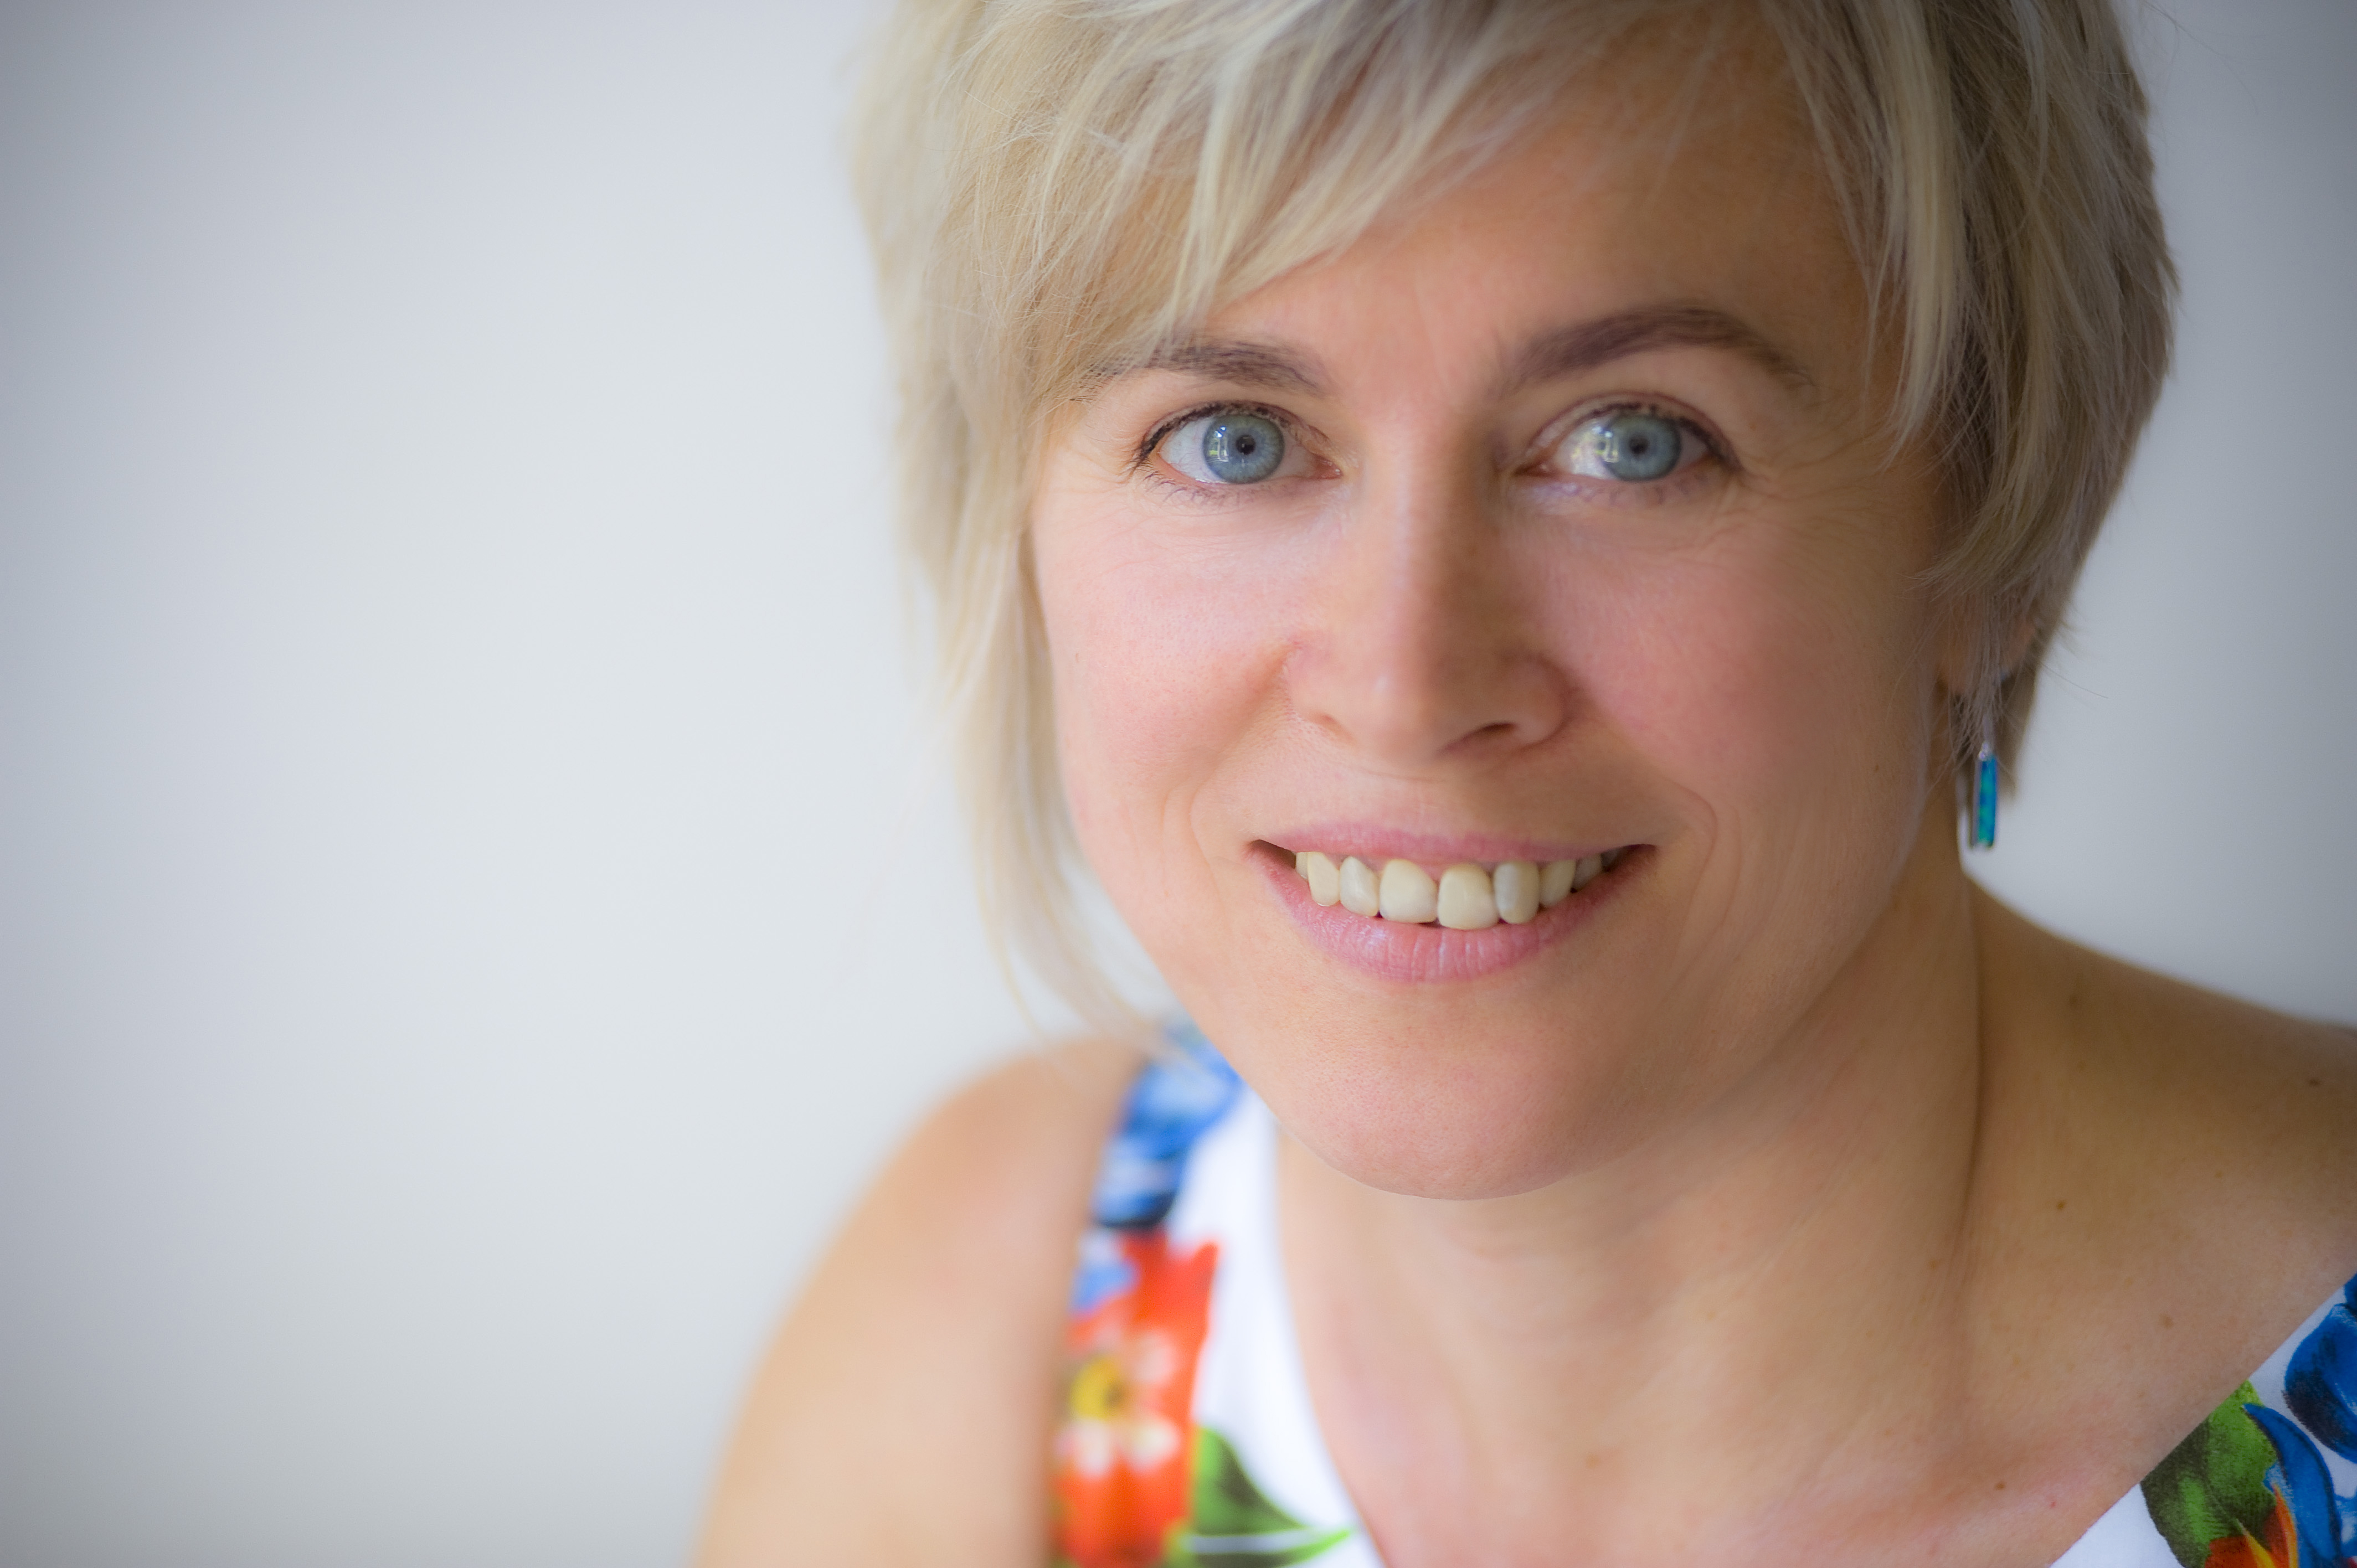 Dr. Ruczek Éva, a Sexual Grounding terápia hazai képviselőjé